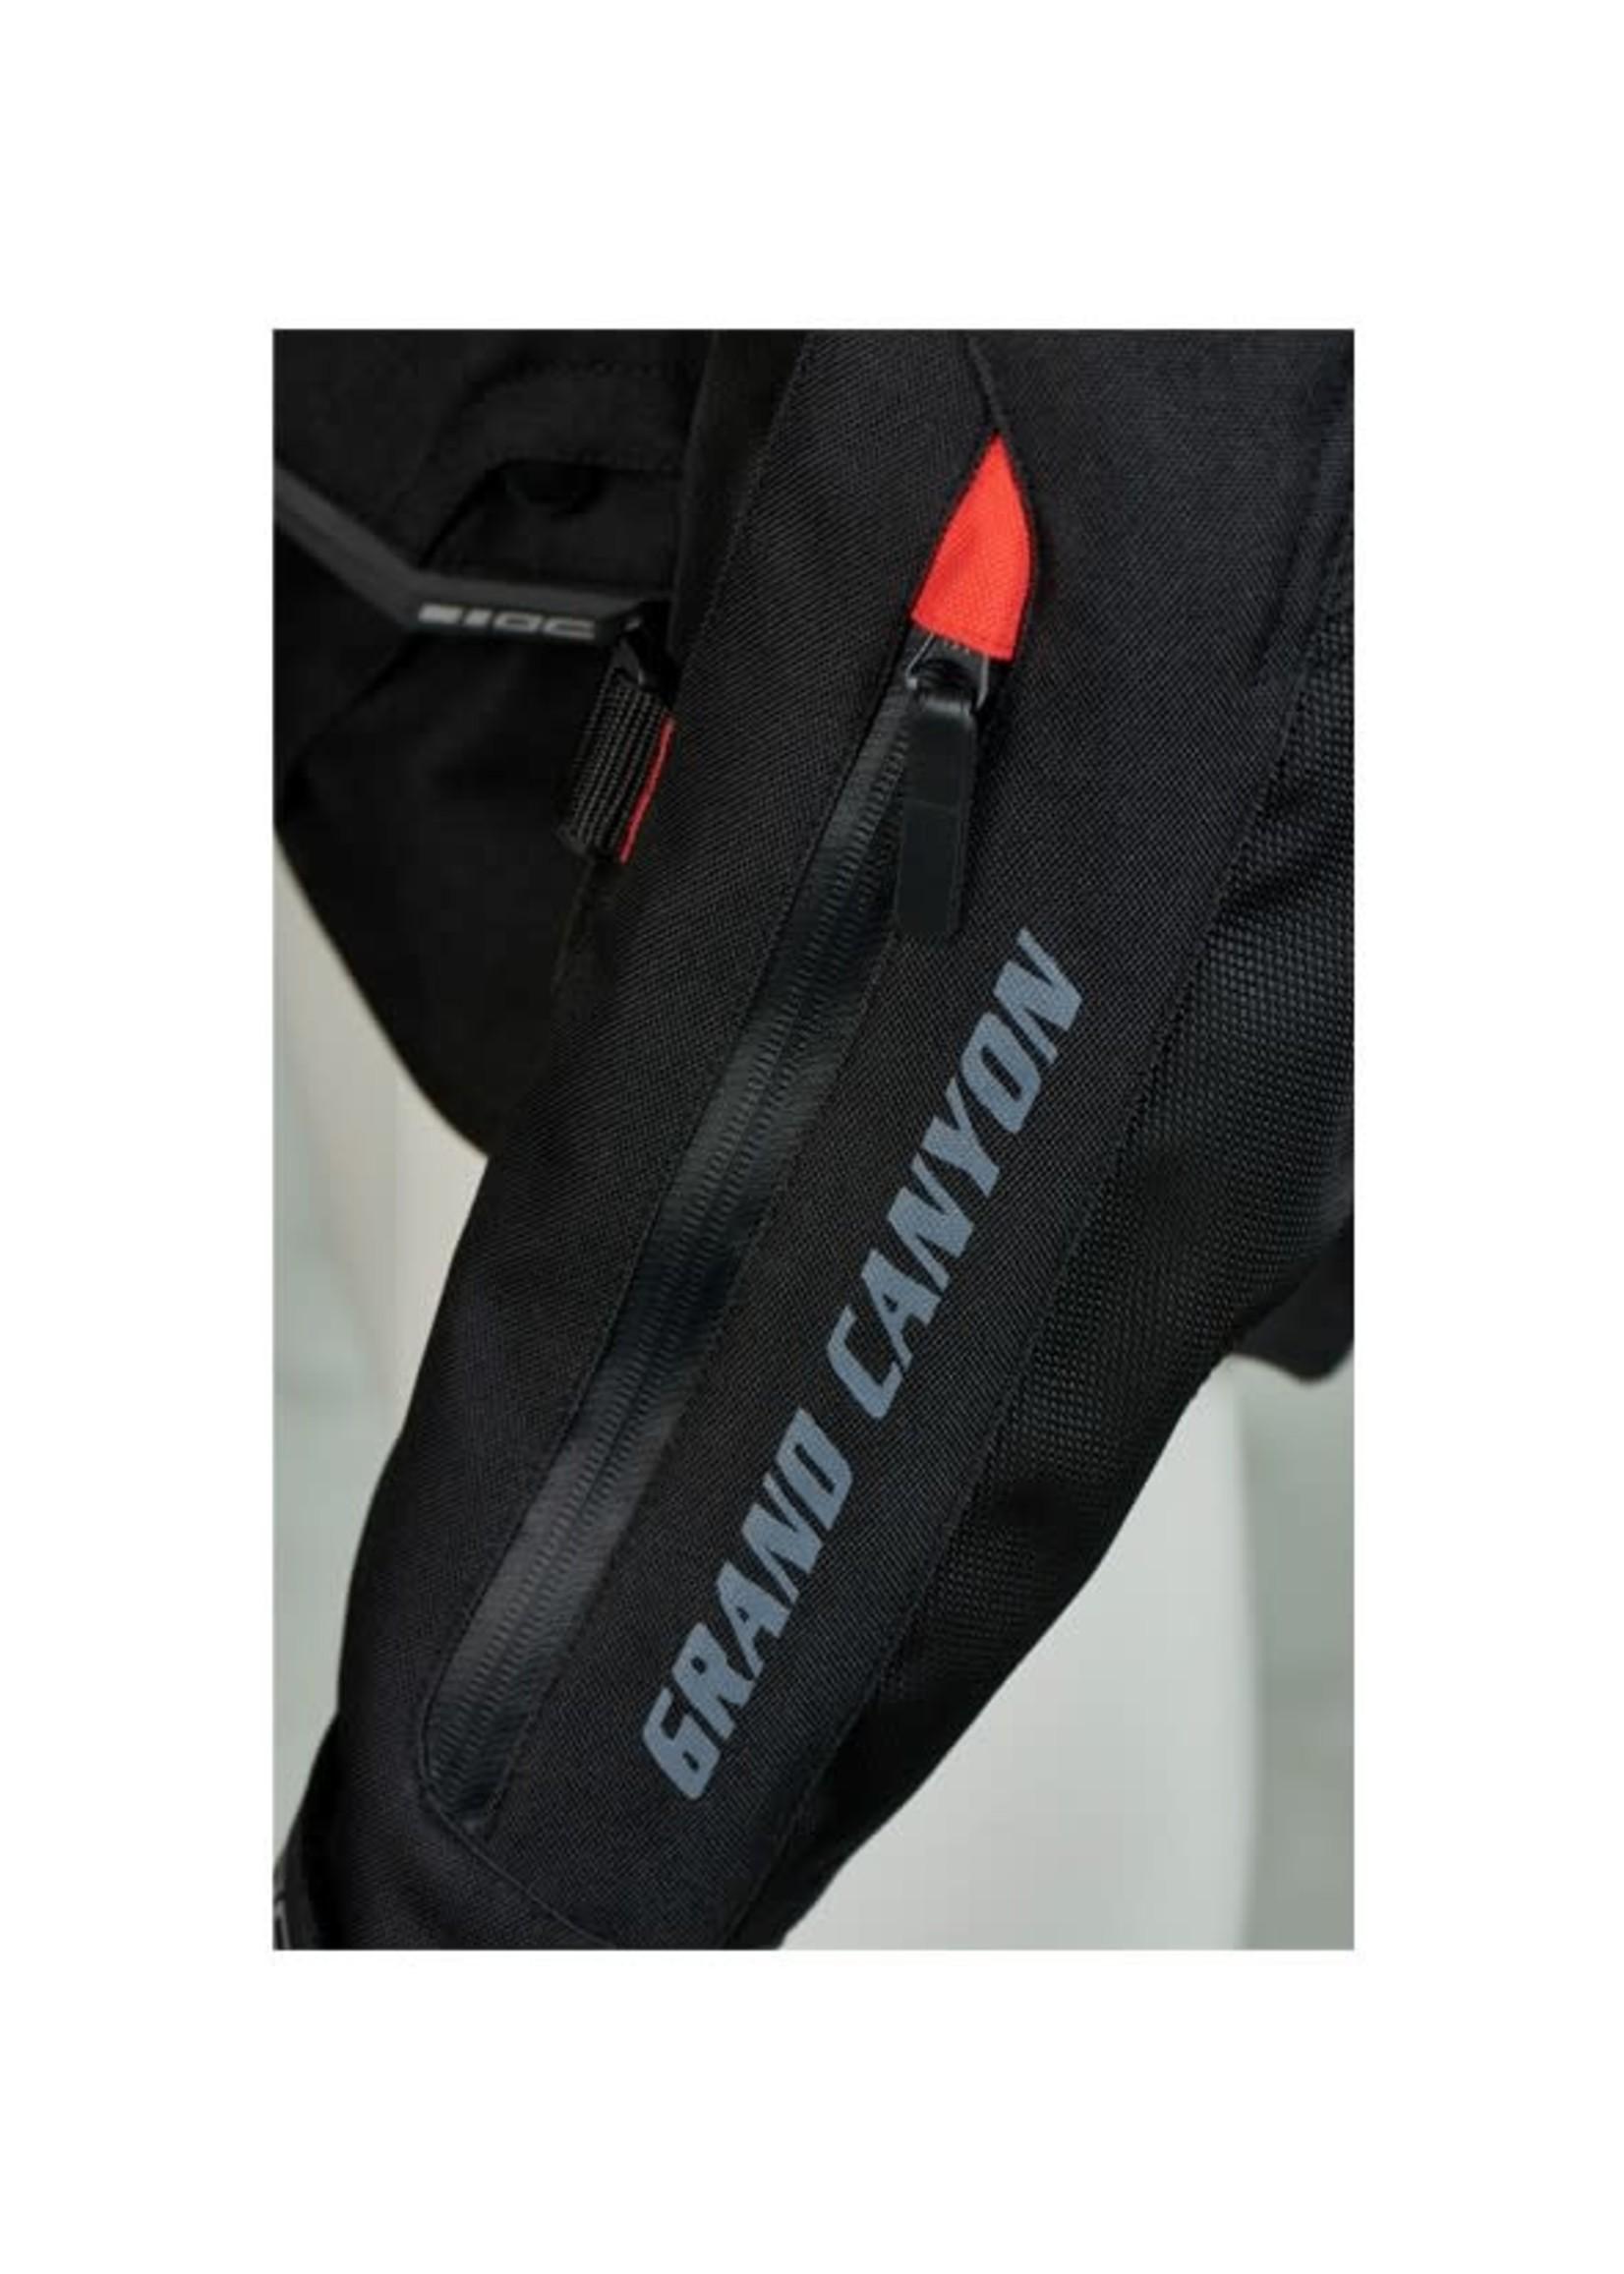 Grand Canyon Bikewear Grand Canyon Ventura Jack (Fluor / Titanium)